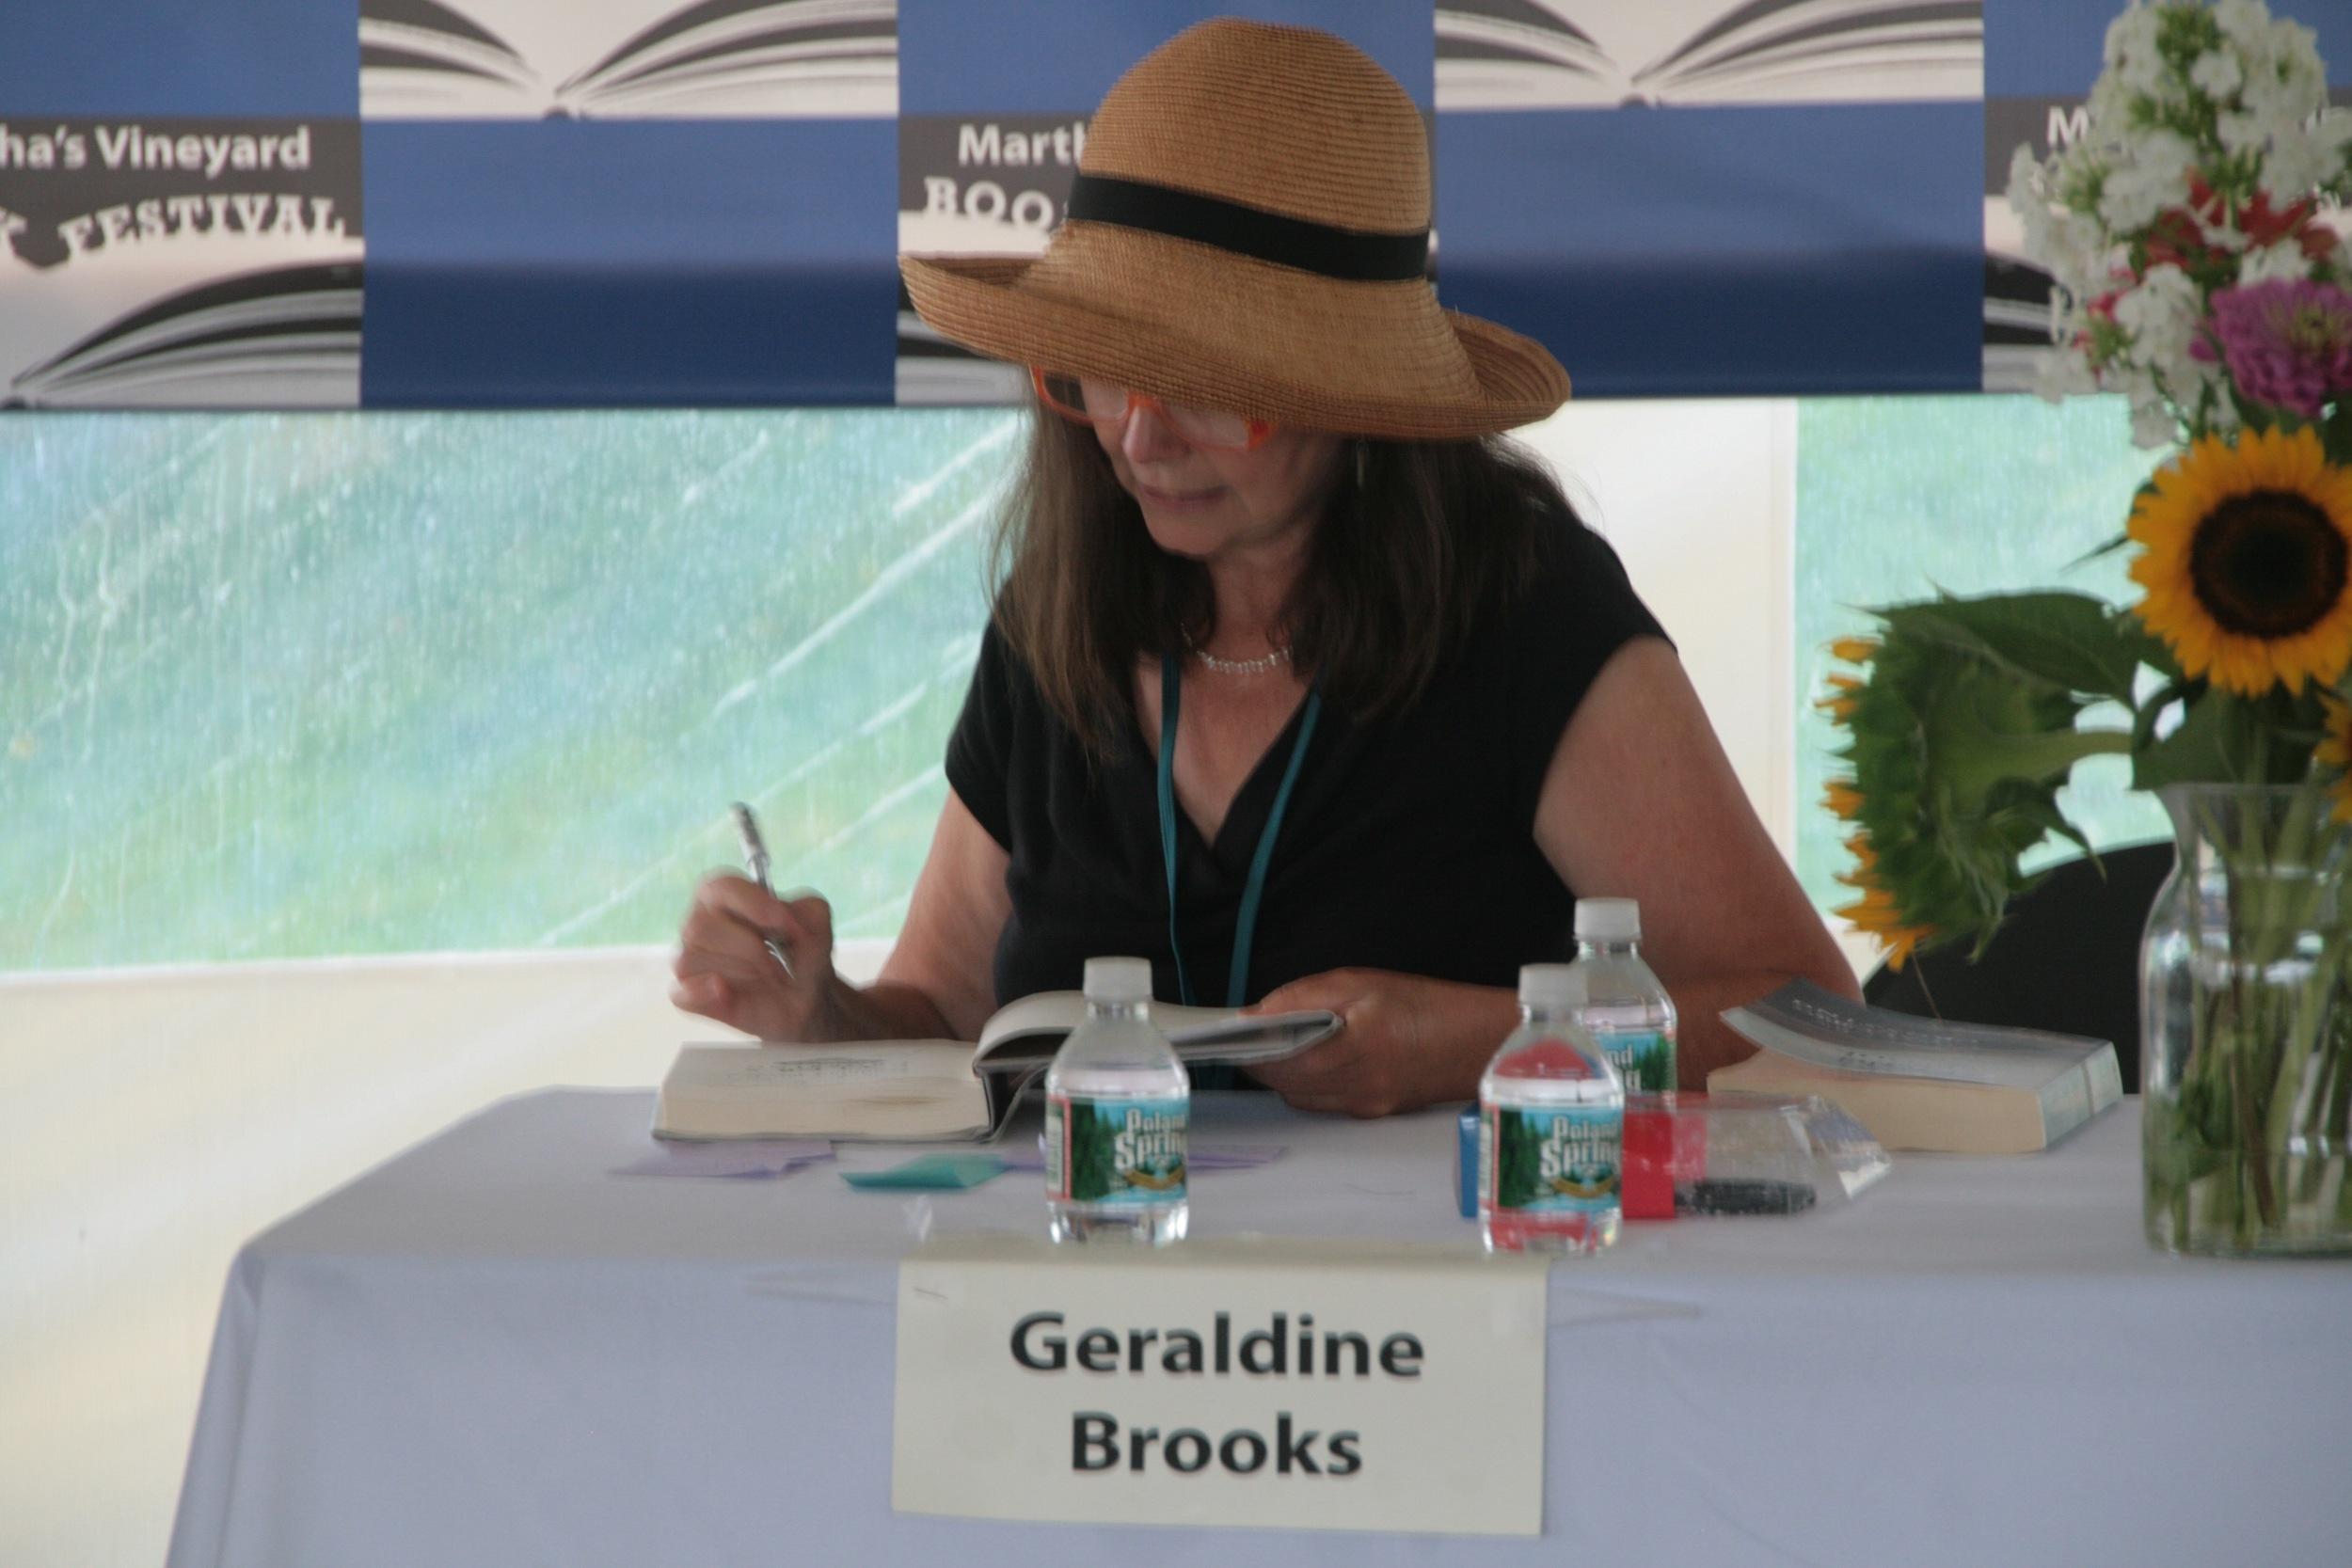 MVBF 2011 - Geraldine Brooks signing.jpg